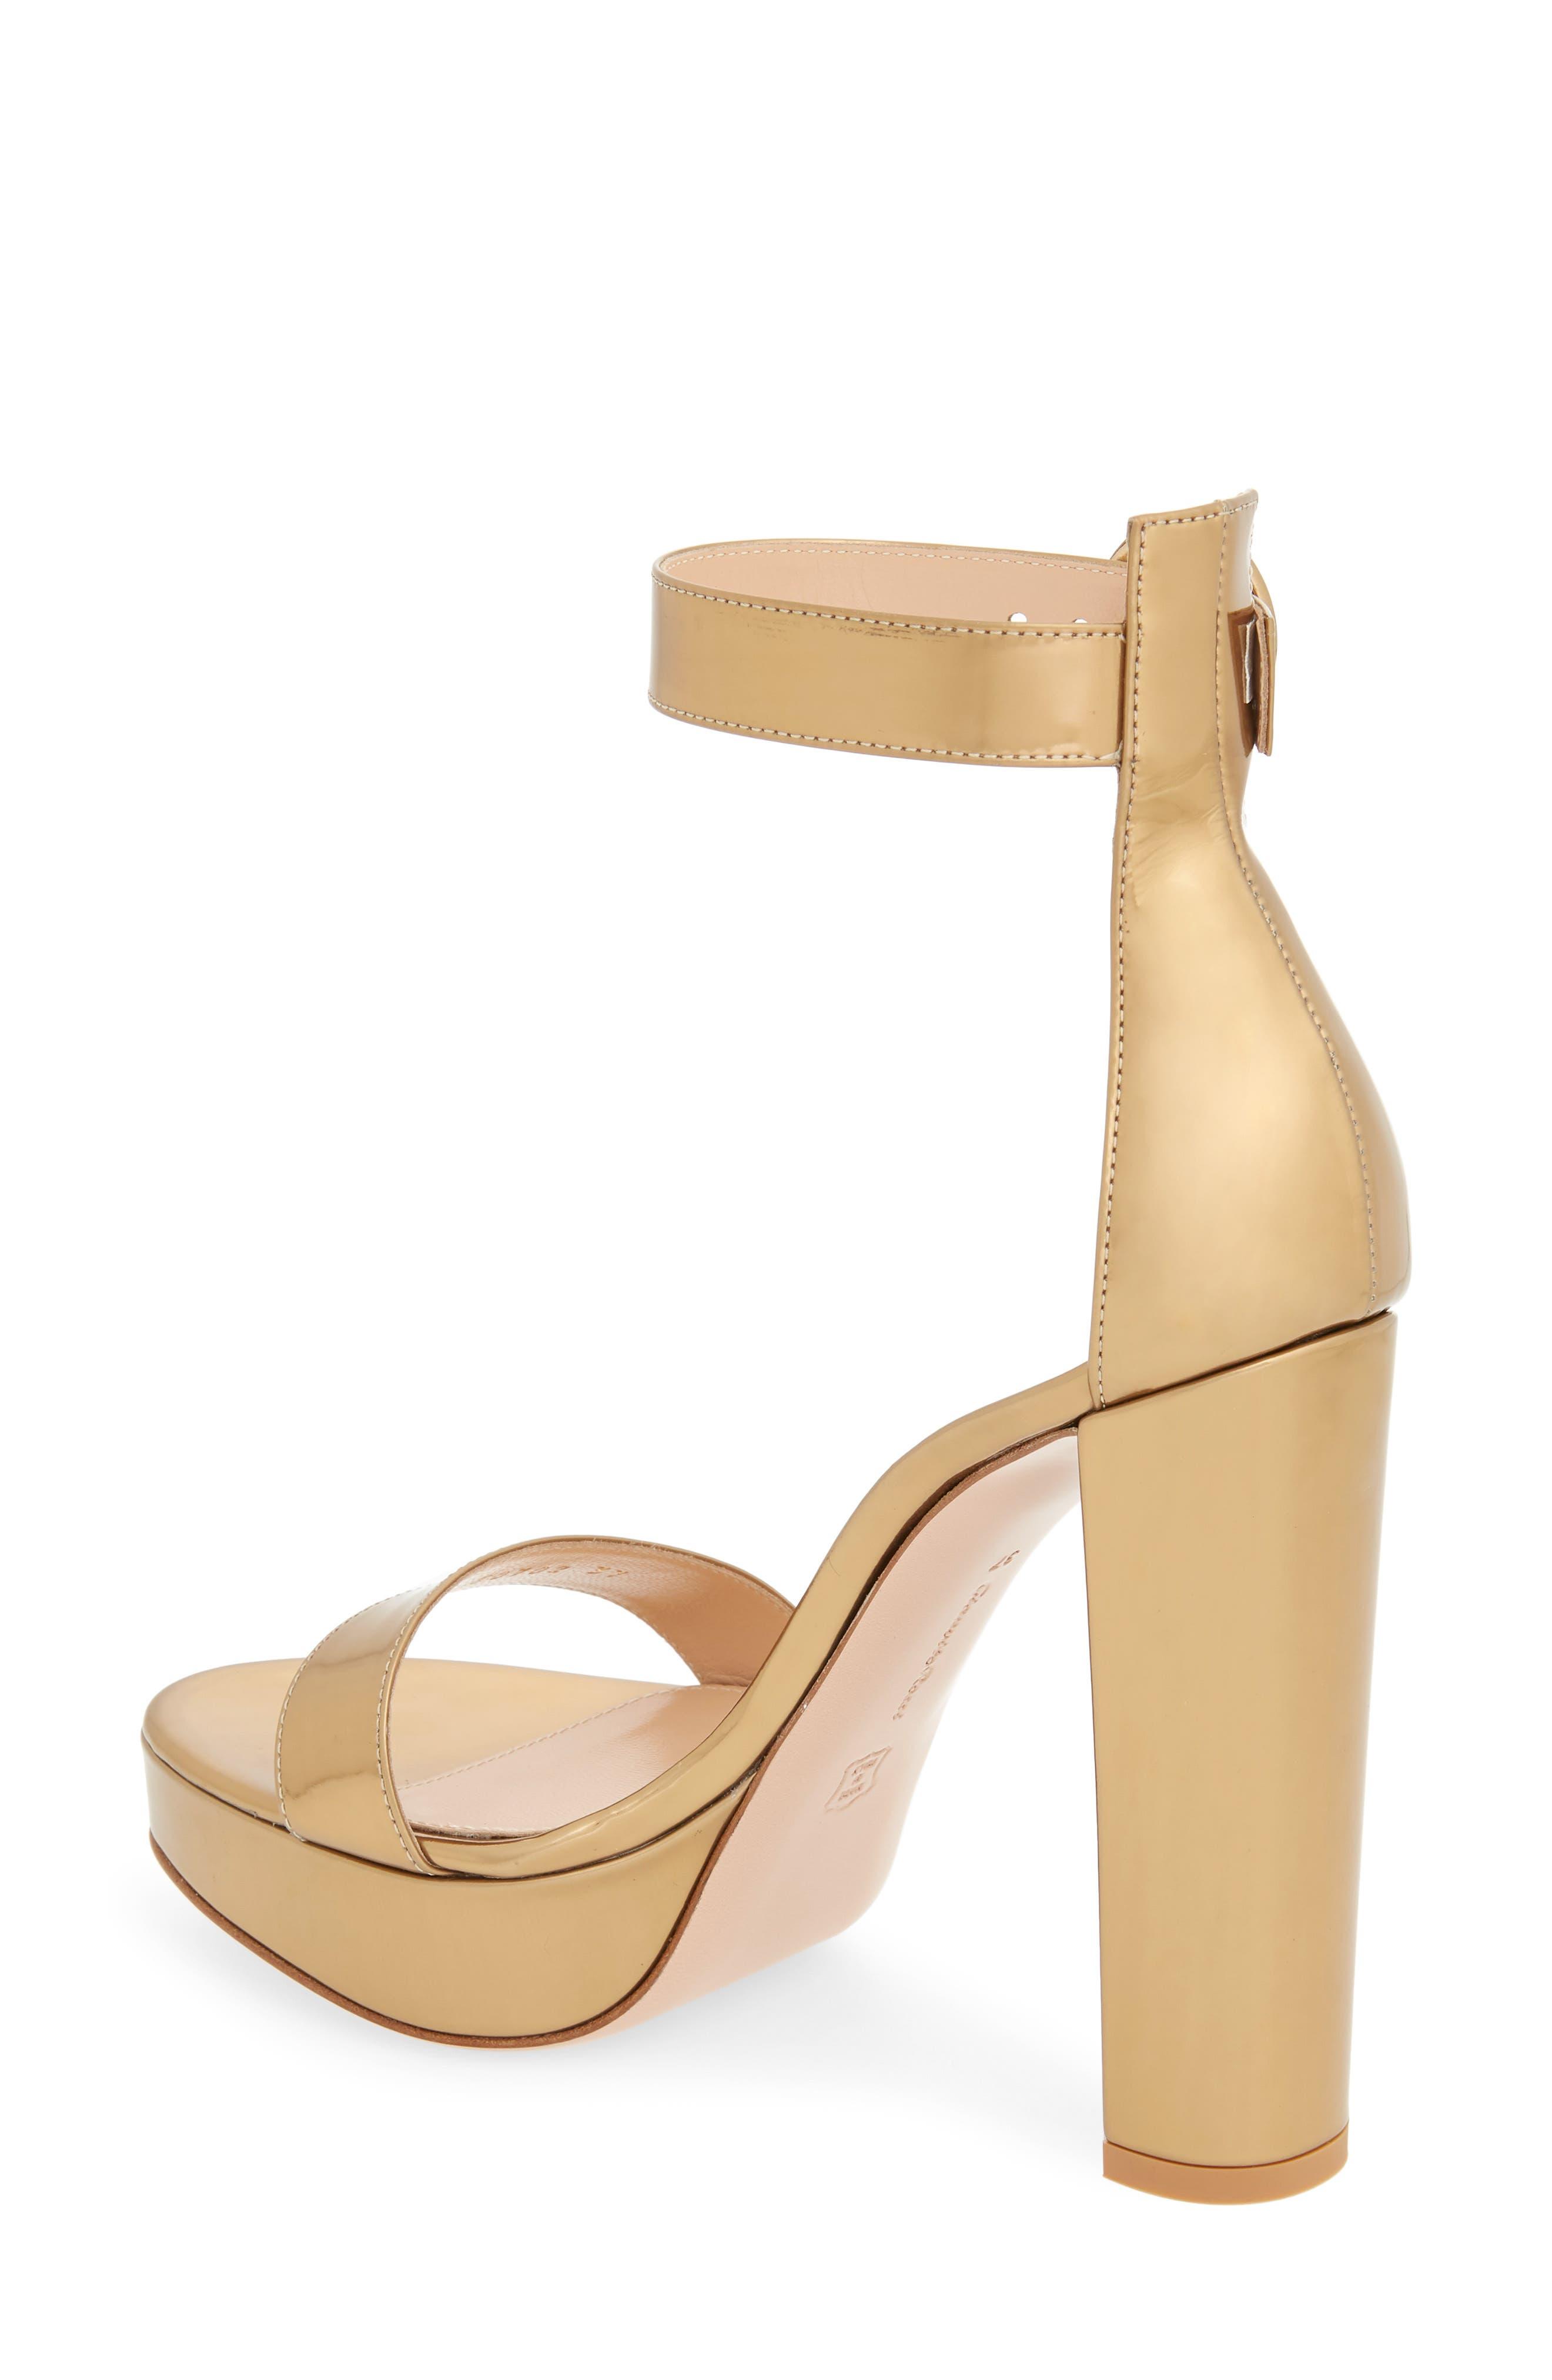 78b108f9ed7 Women s Gianvito Rossi Designer Shoes